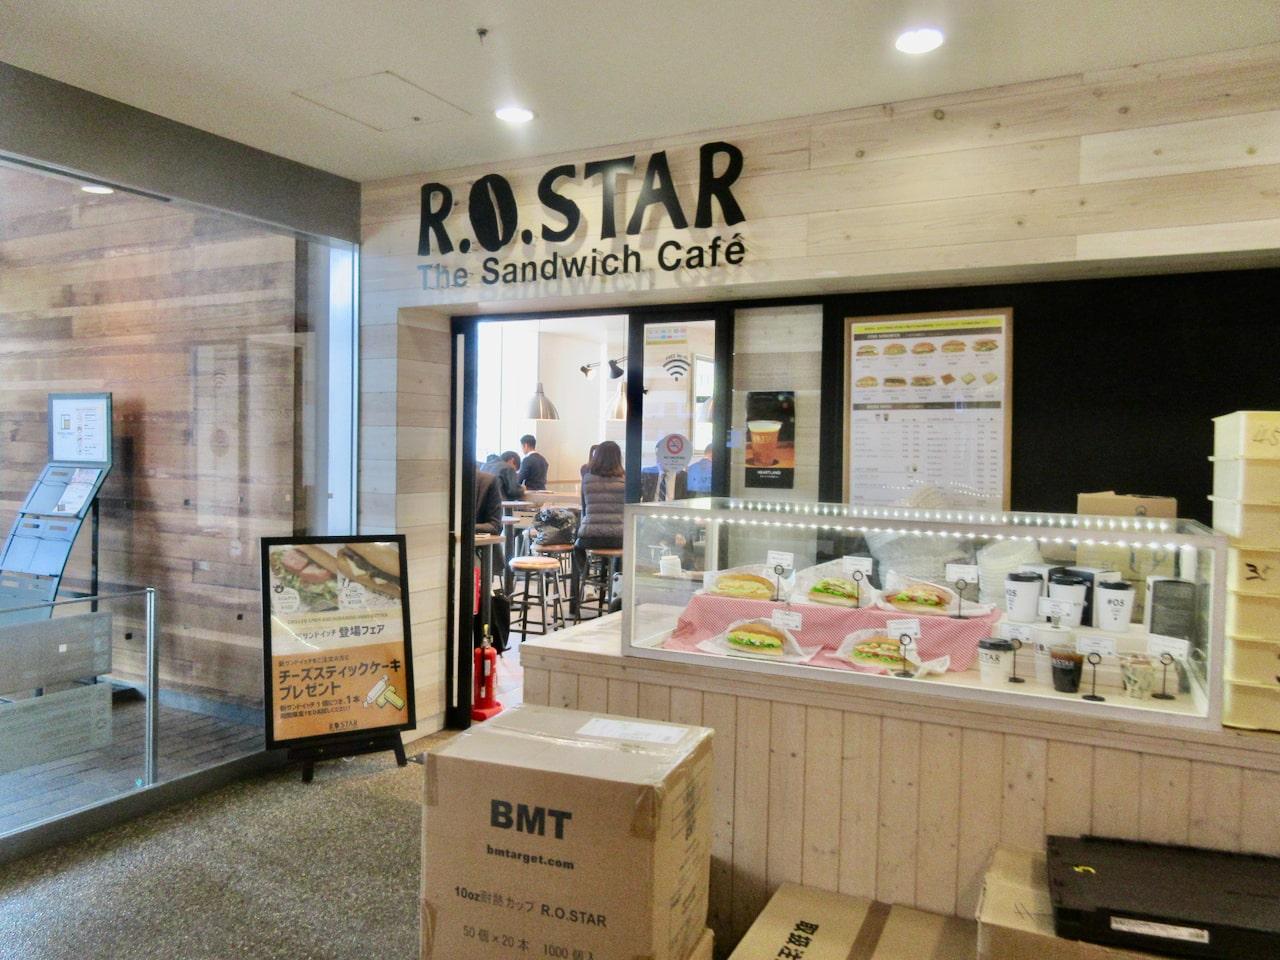 「R.O.Star 豊洲フロント店」にて「新サンドイッチ登場フェア」実施中!